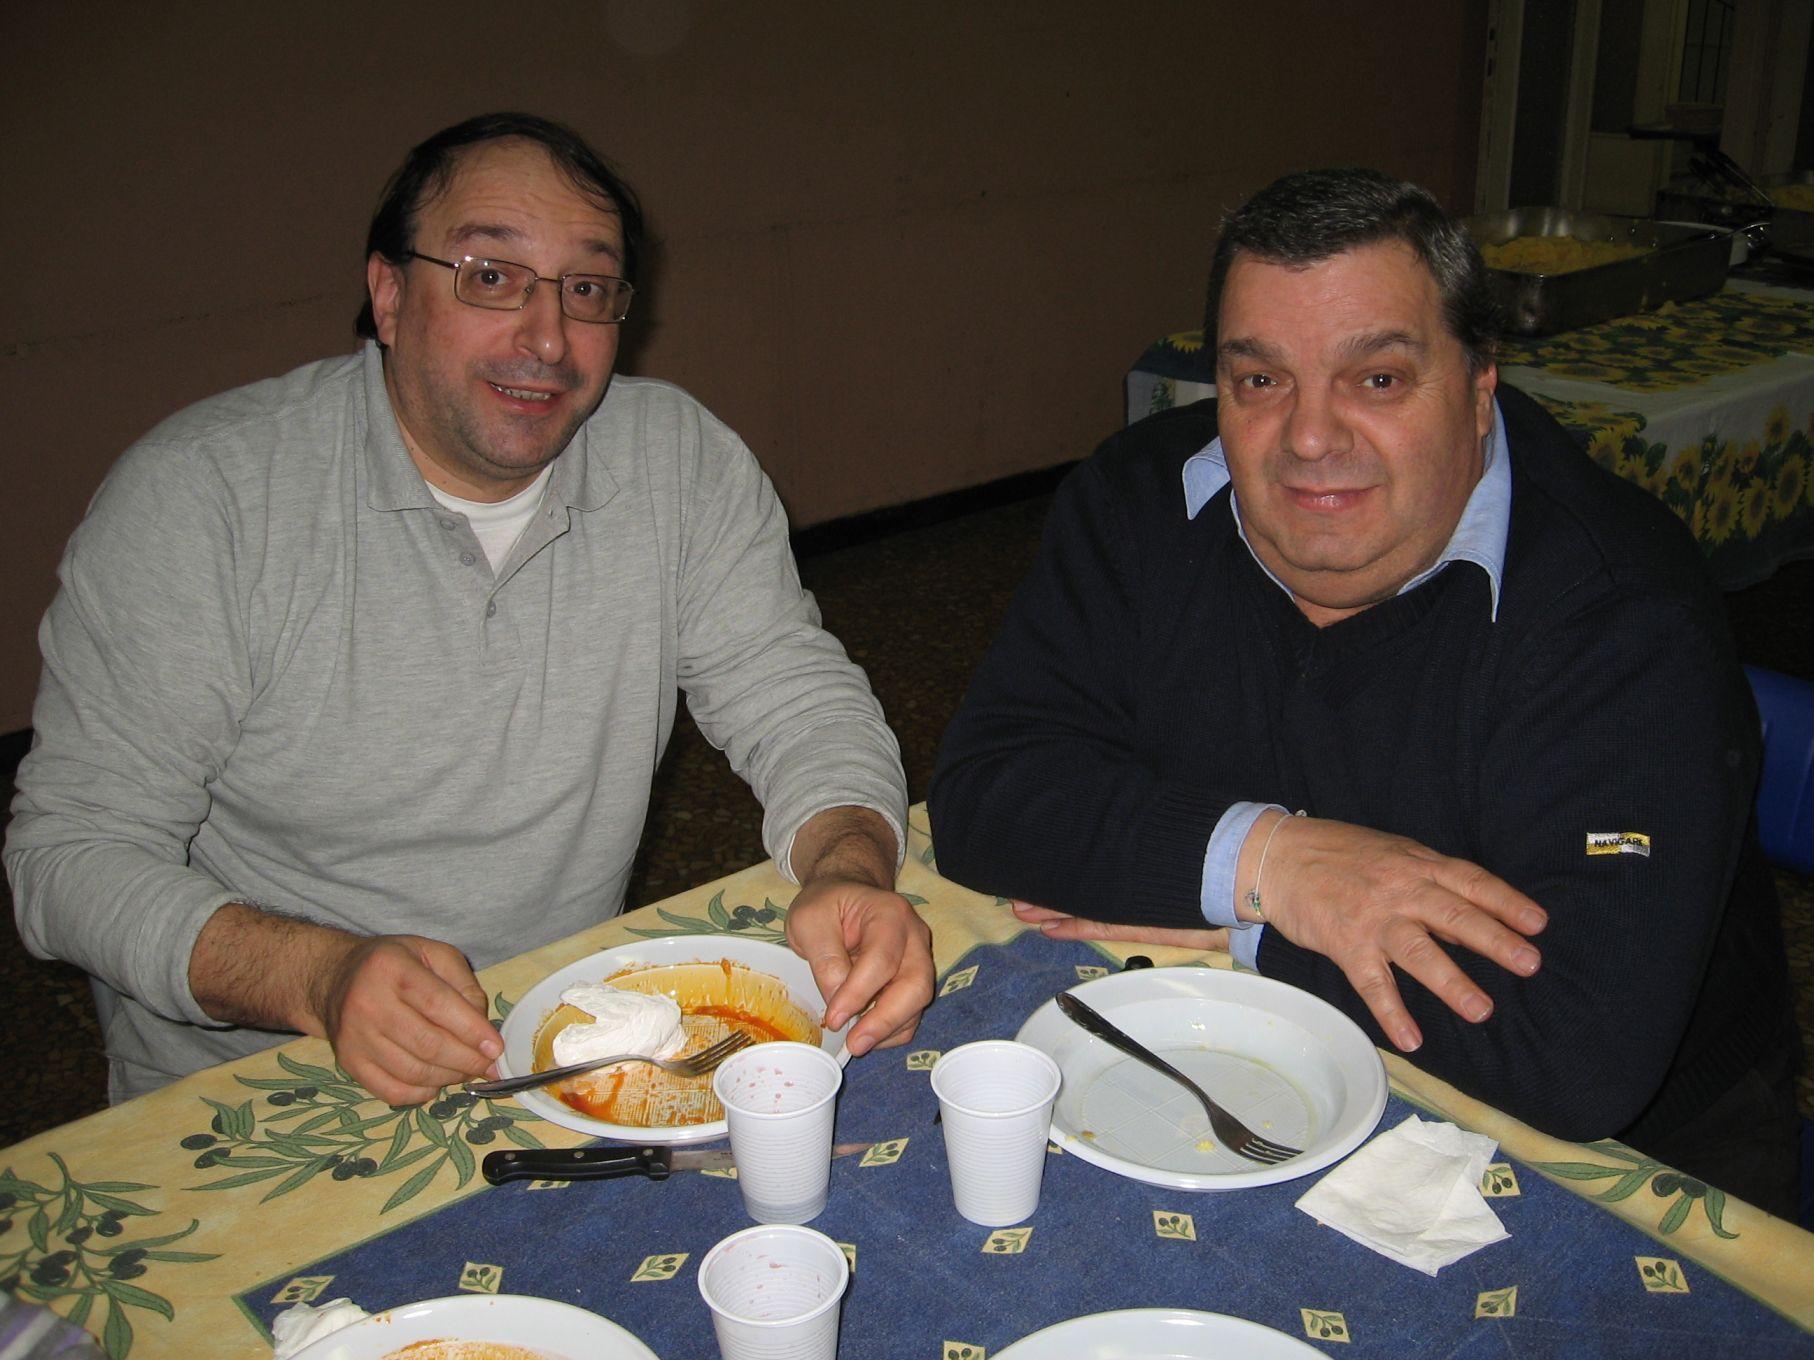 Polentata_Beneficenza-2009-01-18--20.02.08.jpg